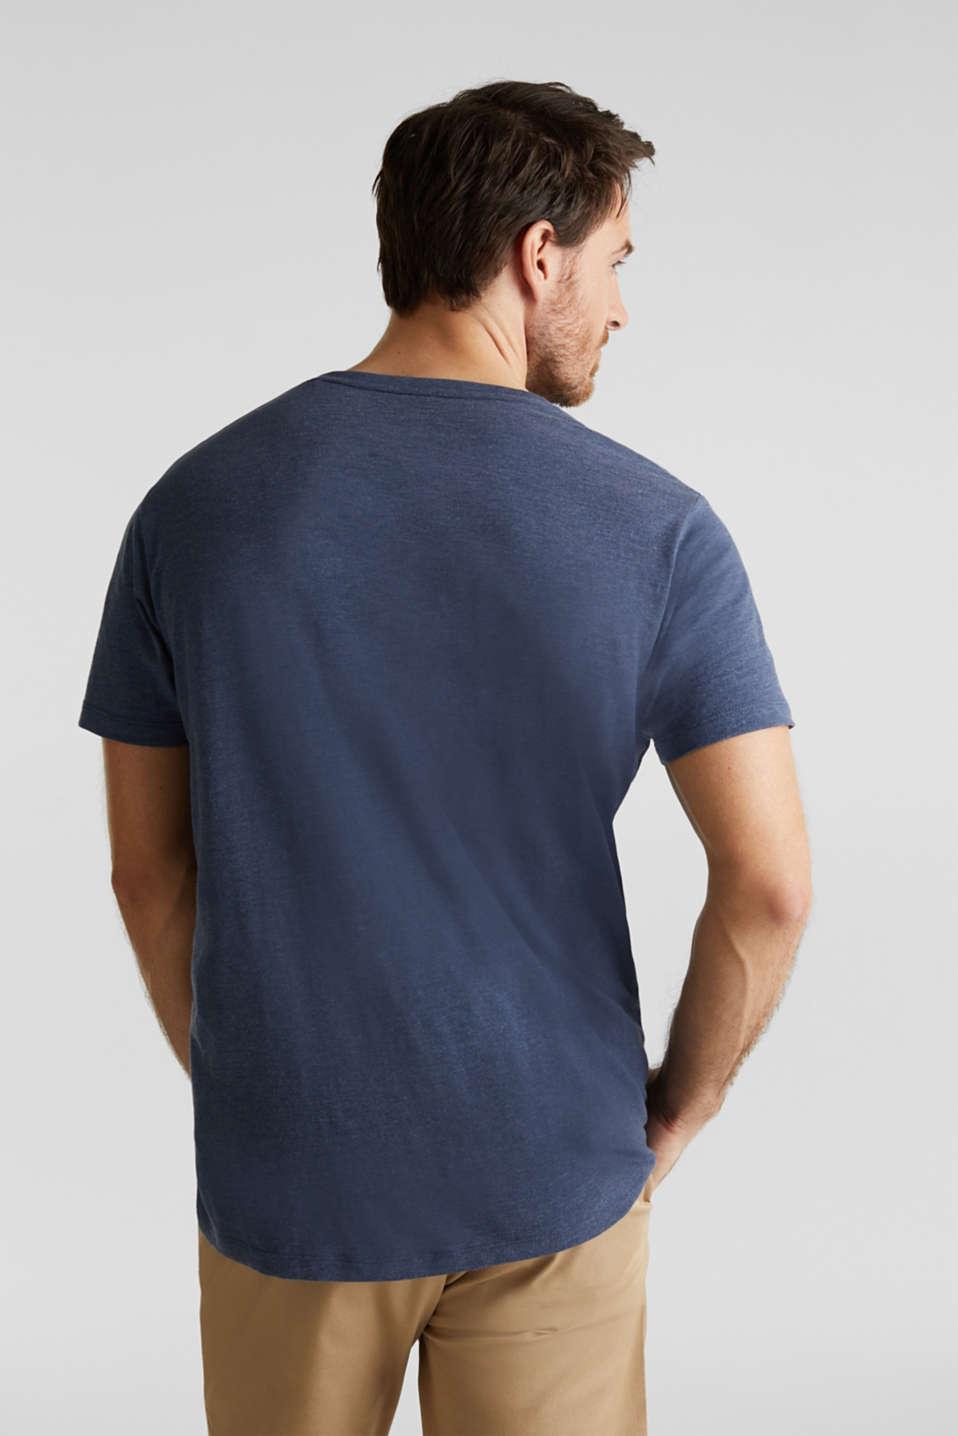 Printed jersey T-shirt, NAVY 5, detail image number 3